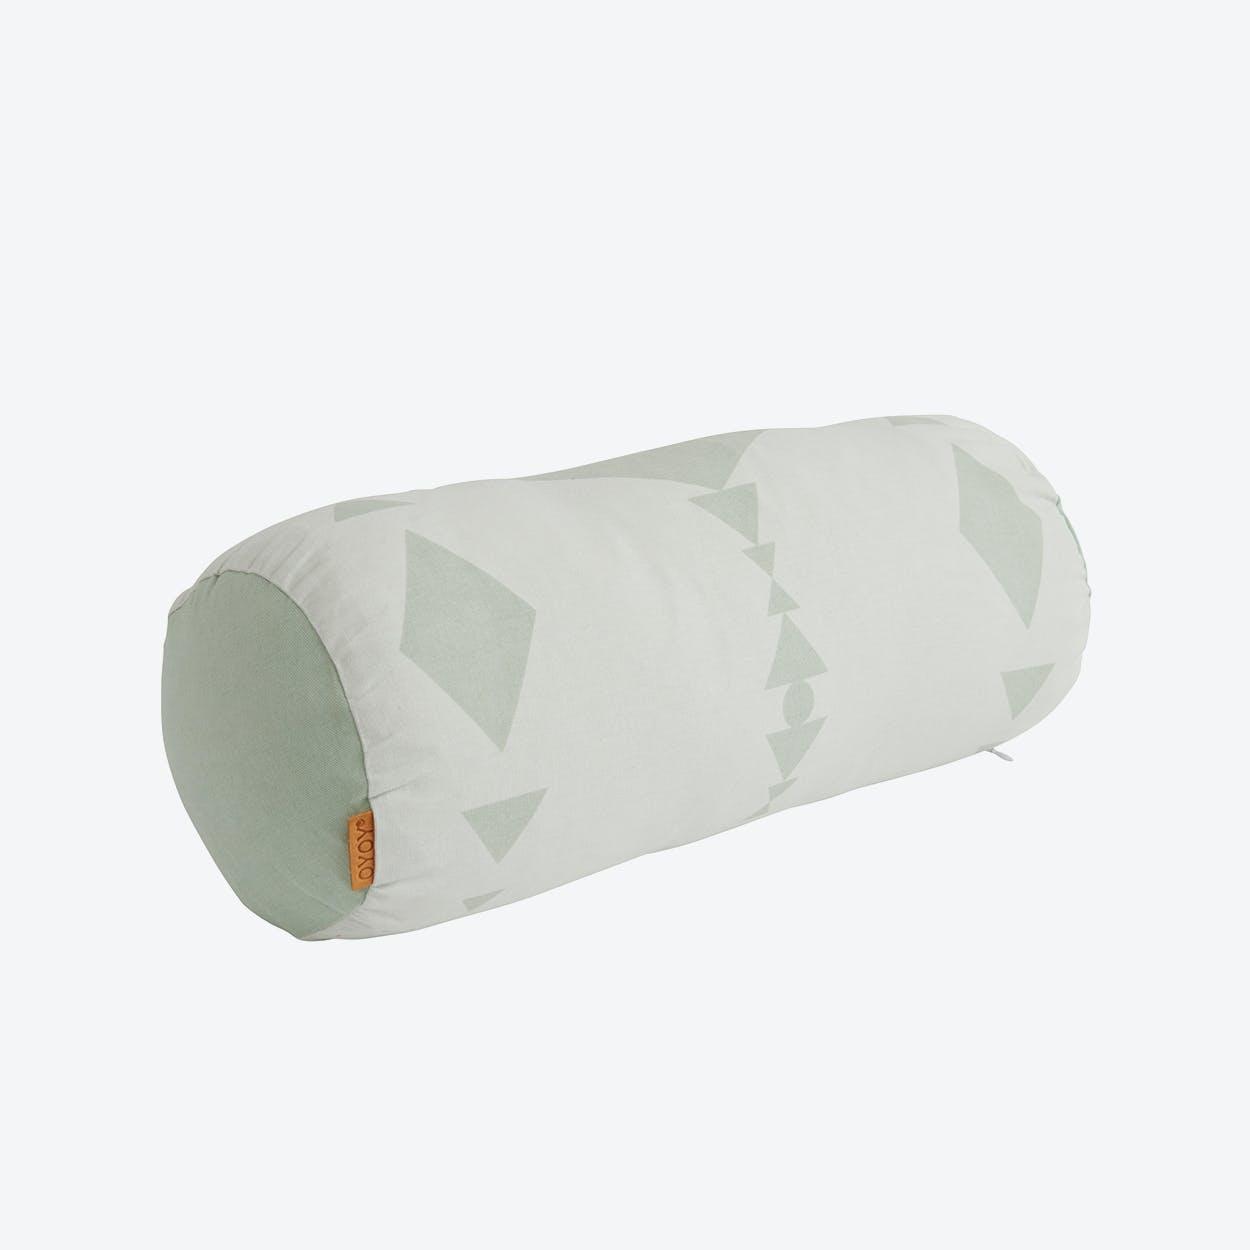 Cylinder Cushion in Mint